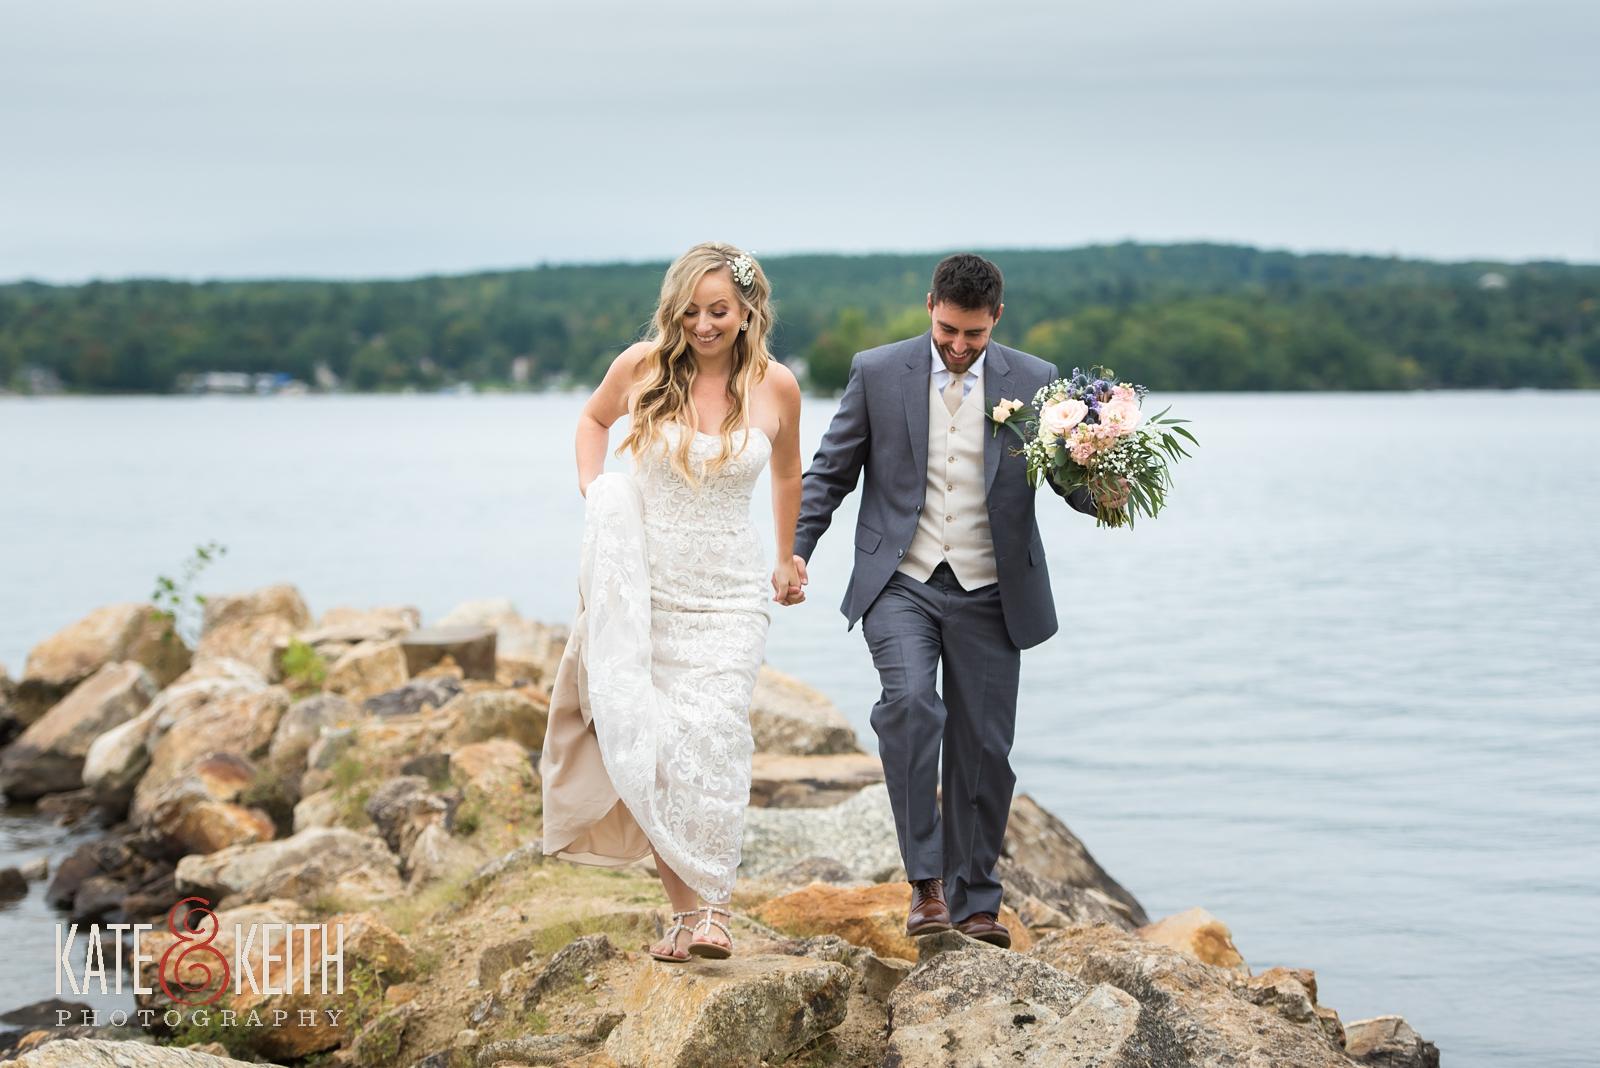 New Hampshire, Lakes Region, Lake Winnipesaukee, The Margate Resort, wedding, outdoor wedding, lakeside wedding, wedding portraits, couple portraits, couple photos, bride and groom photos, lakeside wedding portraits